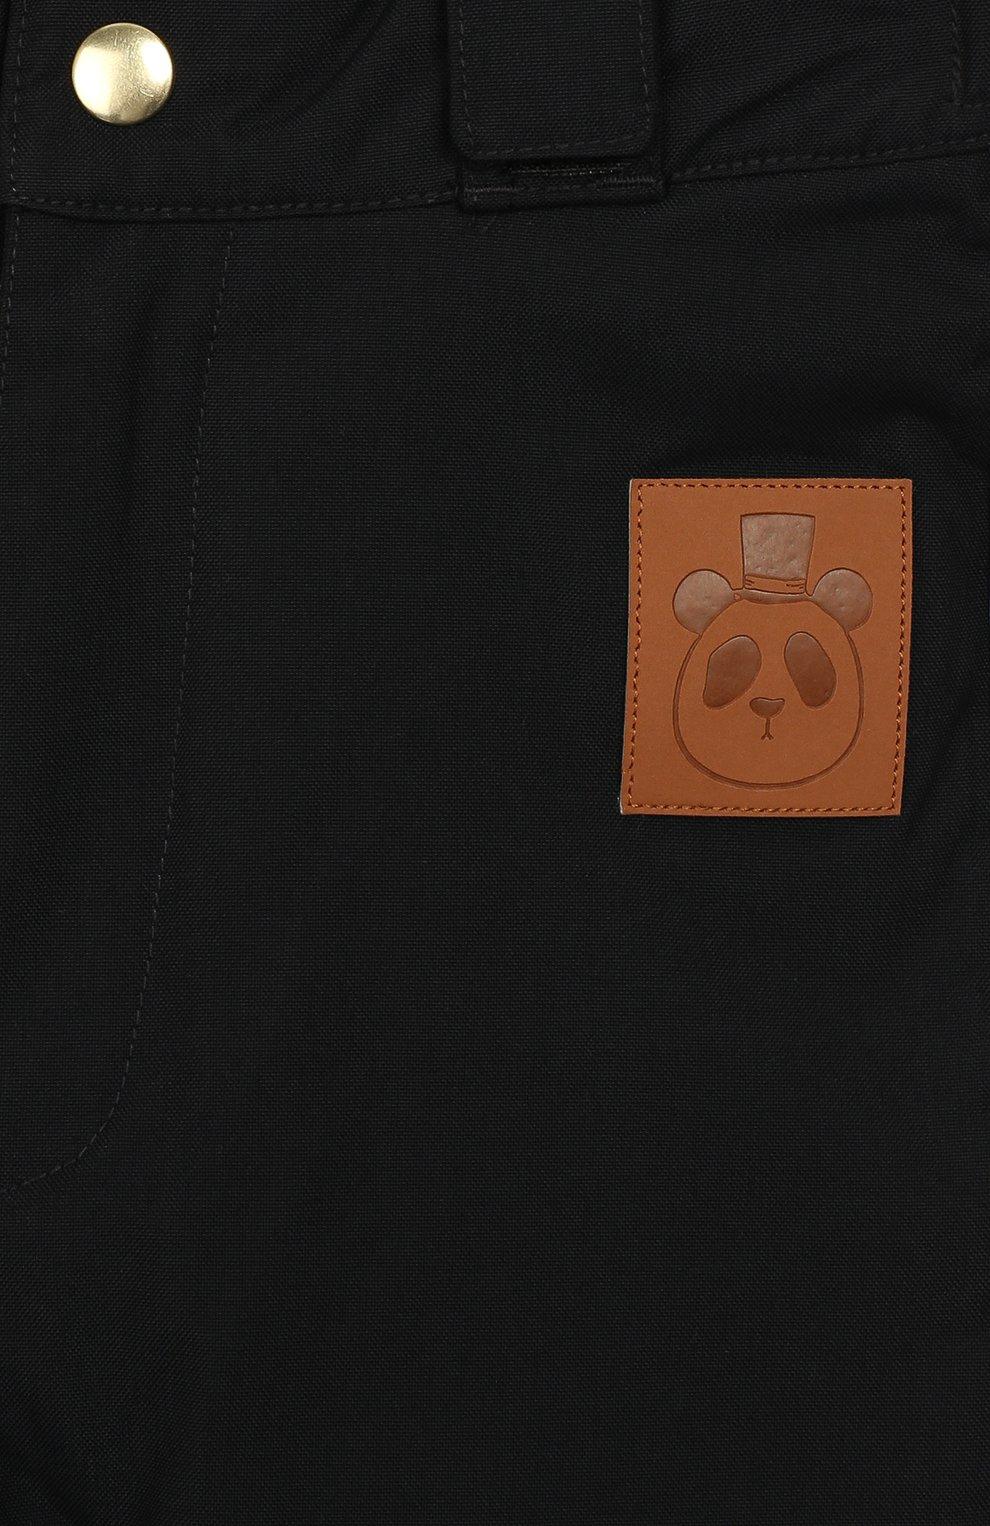 Детский утепленные брюки MINI RODINI черного цвета, арт. 19730101 | Фото 3